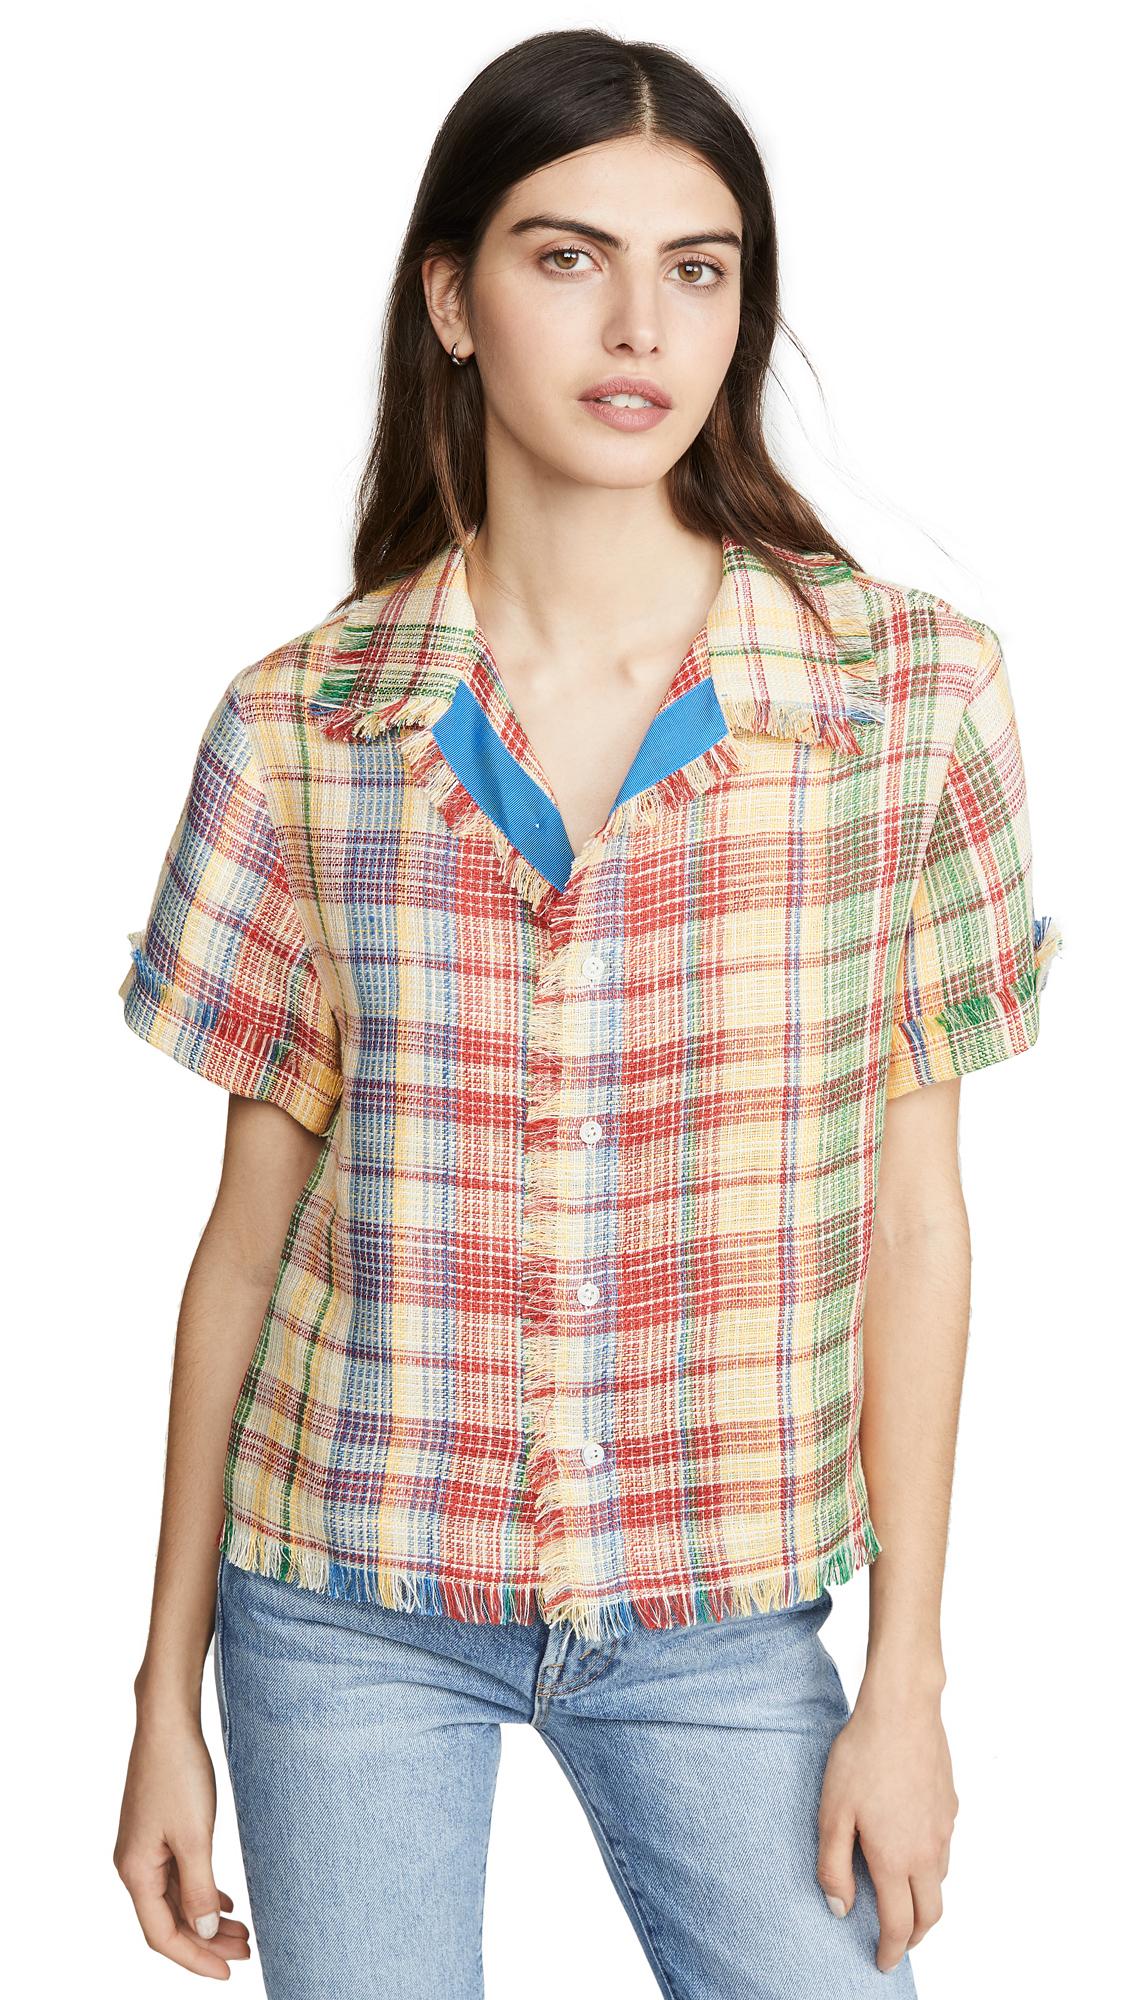 Monse Basket Weave Havana Shirt - 40% Off Sale